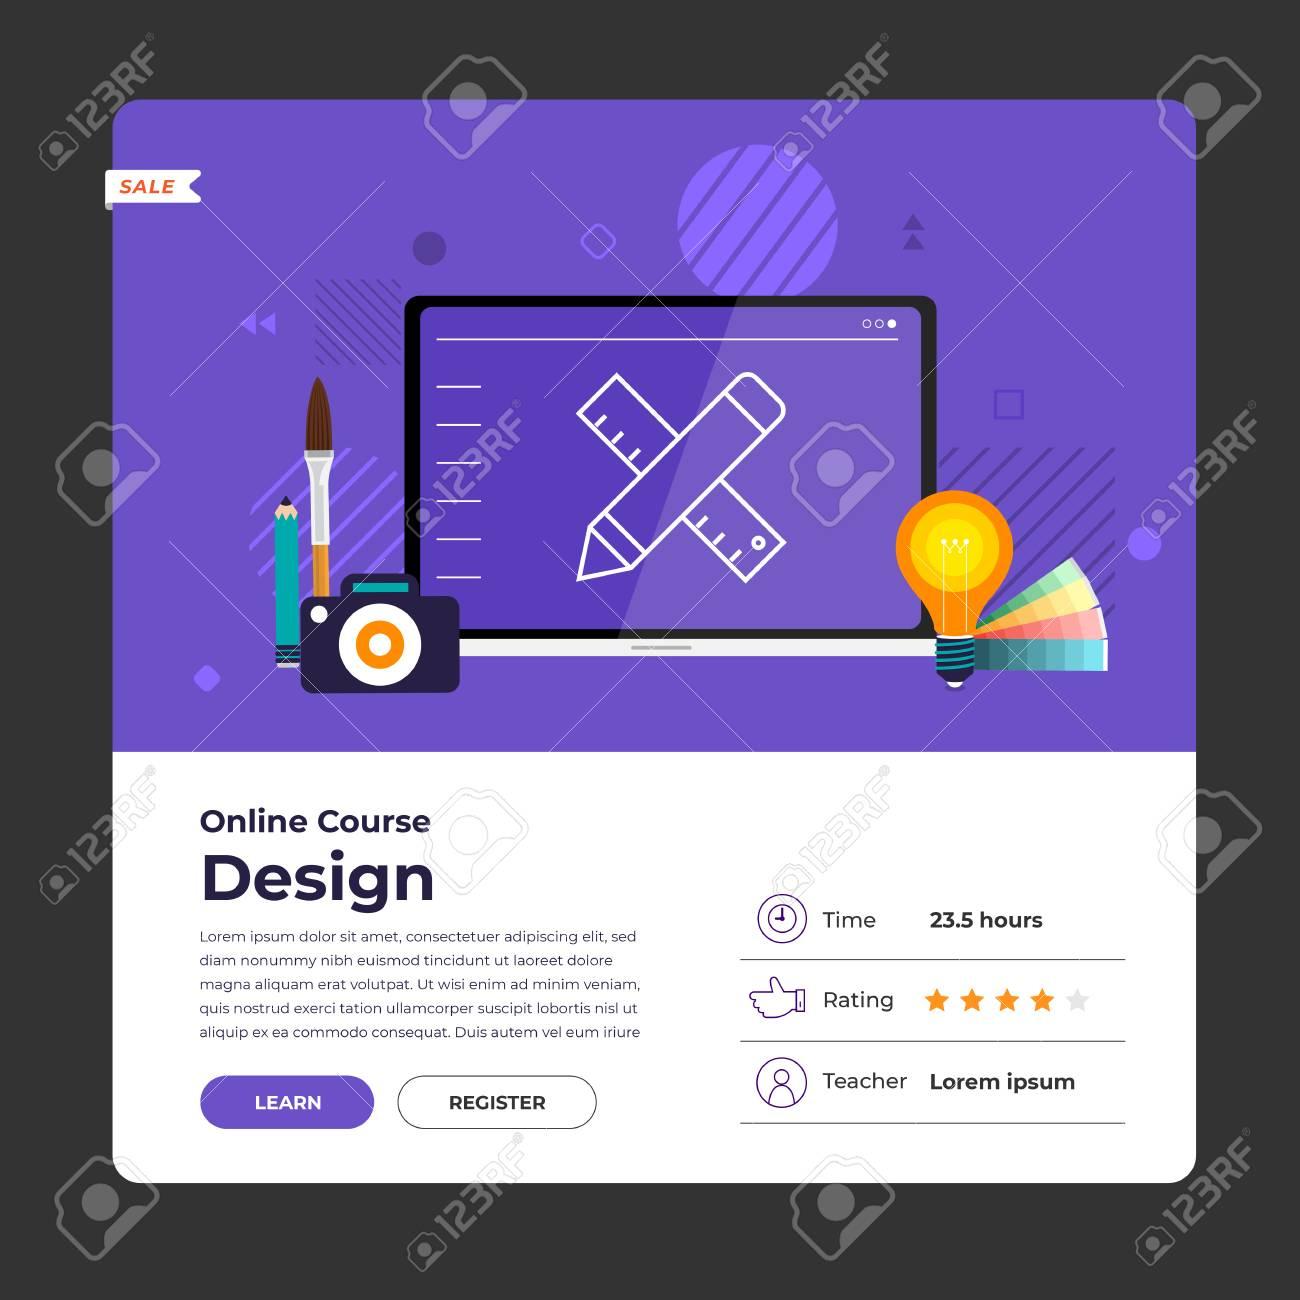 Mockup design landing page website education online course graphic